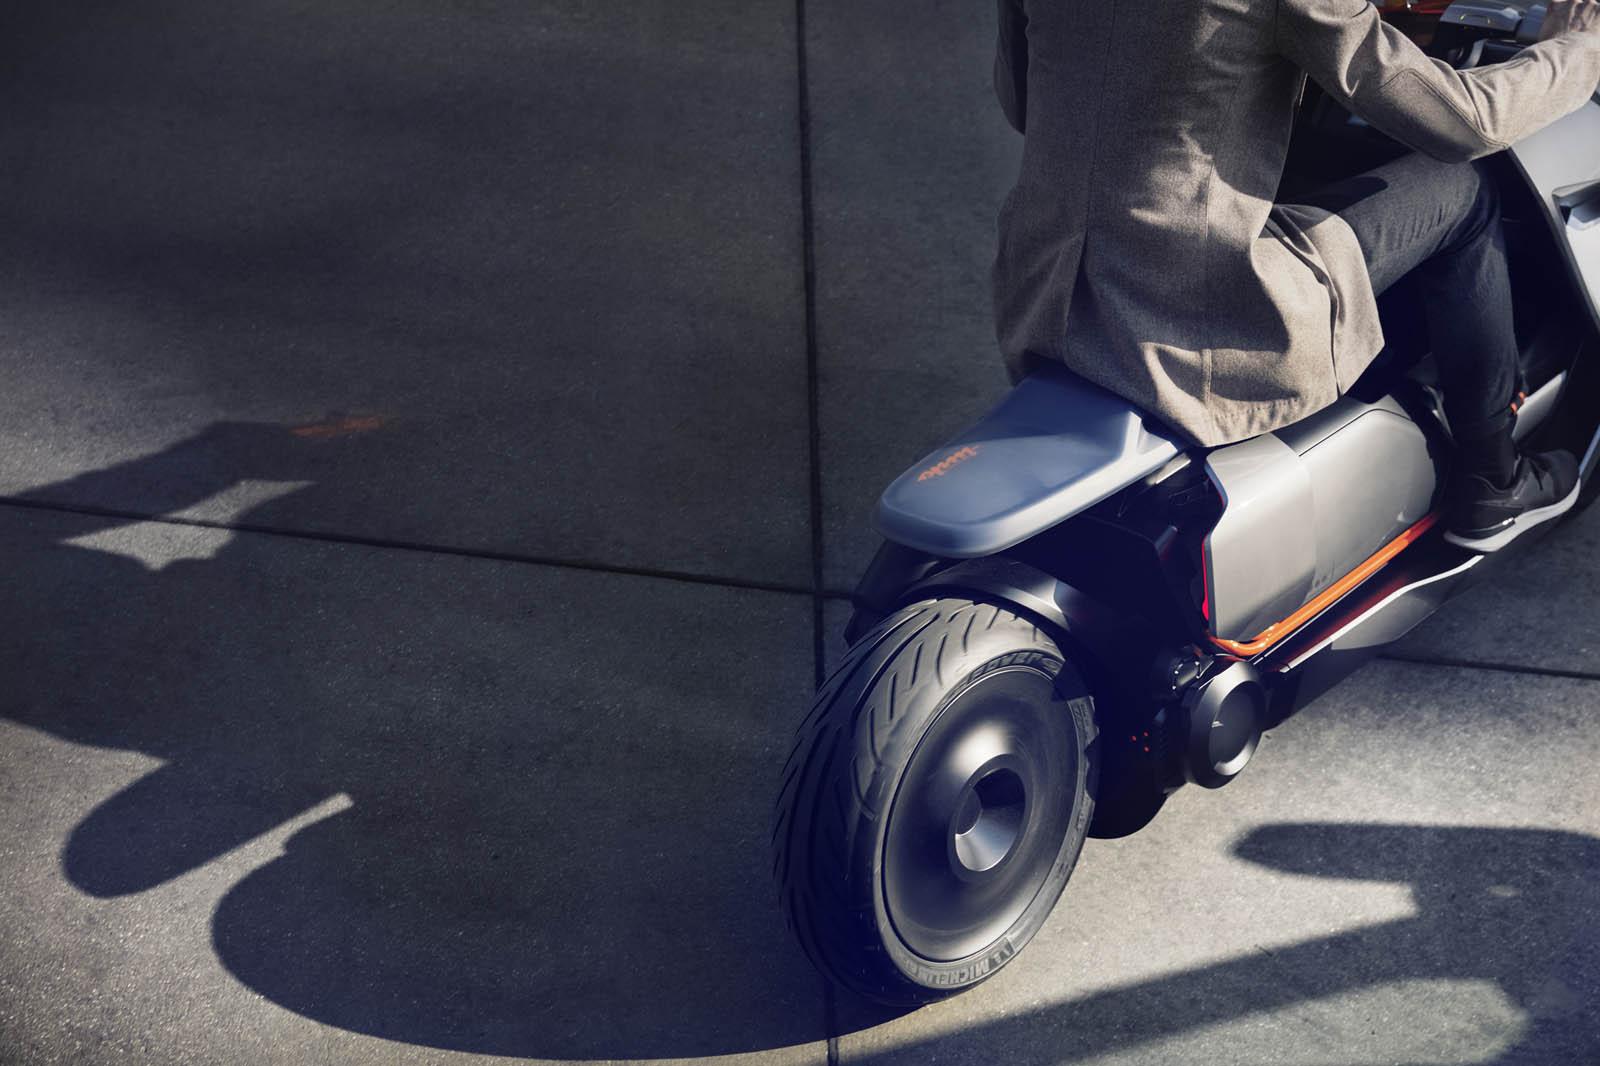 BMW-Motorrad-Concept-Link-P90260583-highRes.jpg